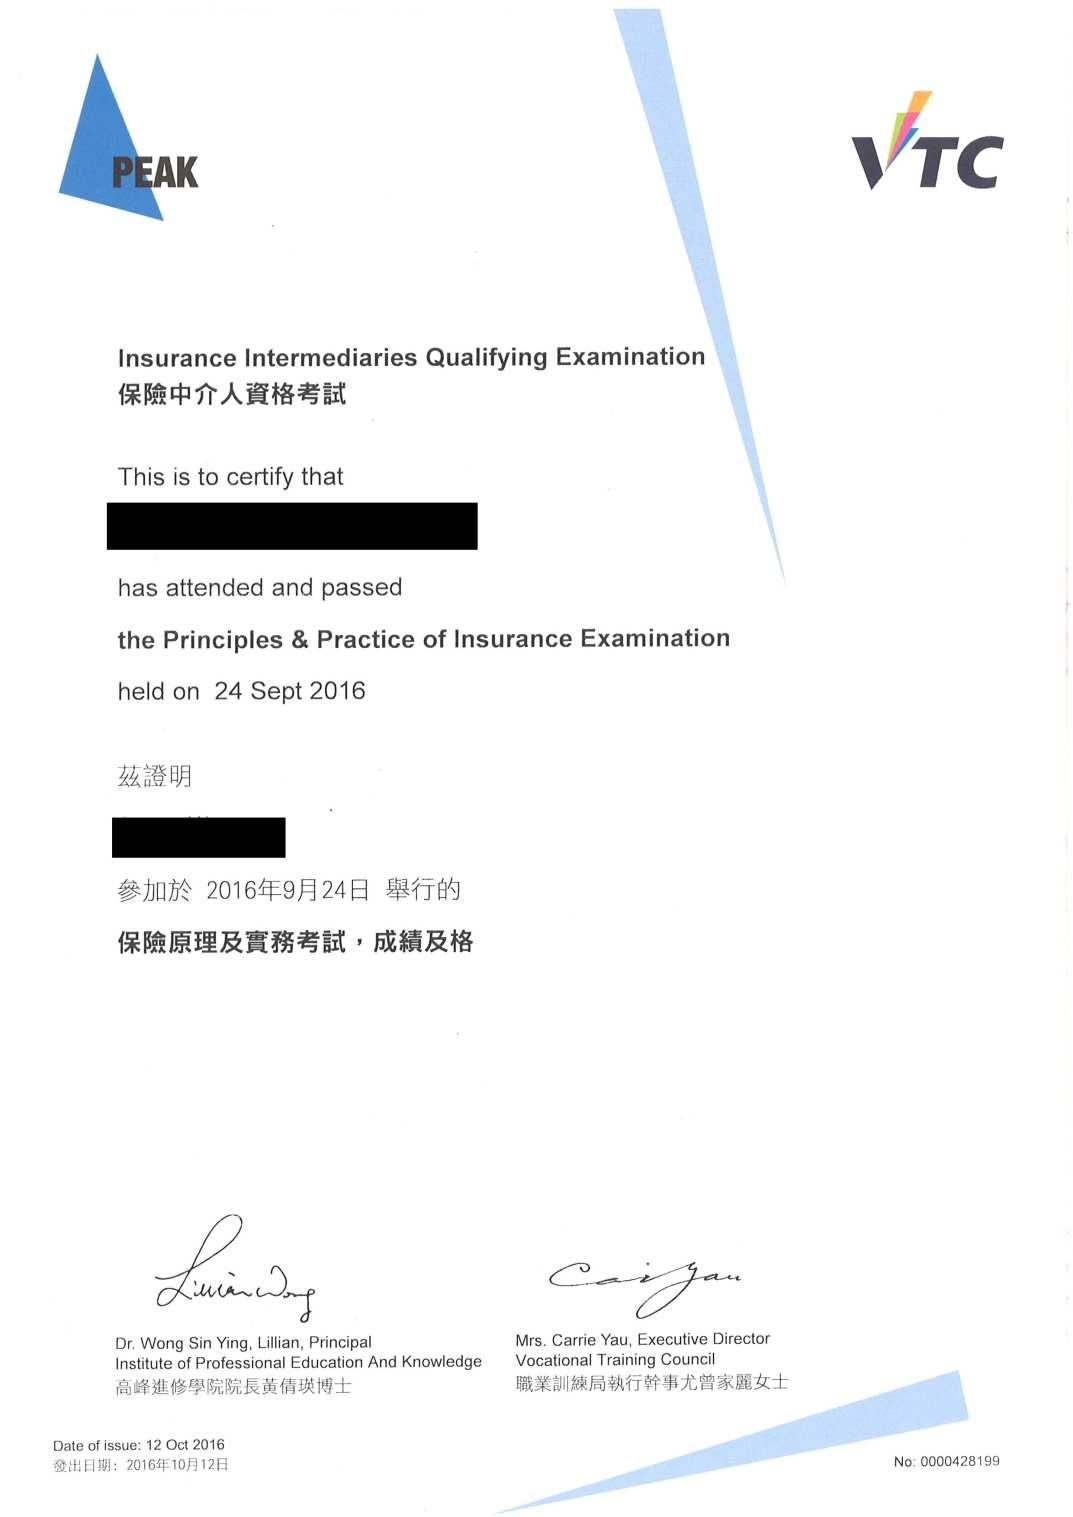 YCK 24/9/2016 IIQE Paper 1 保險中介人資格考試卷一 Pass